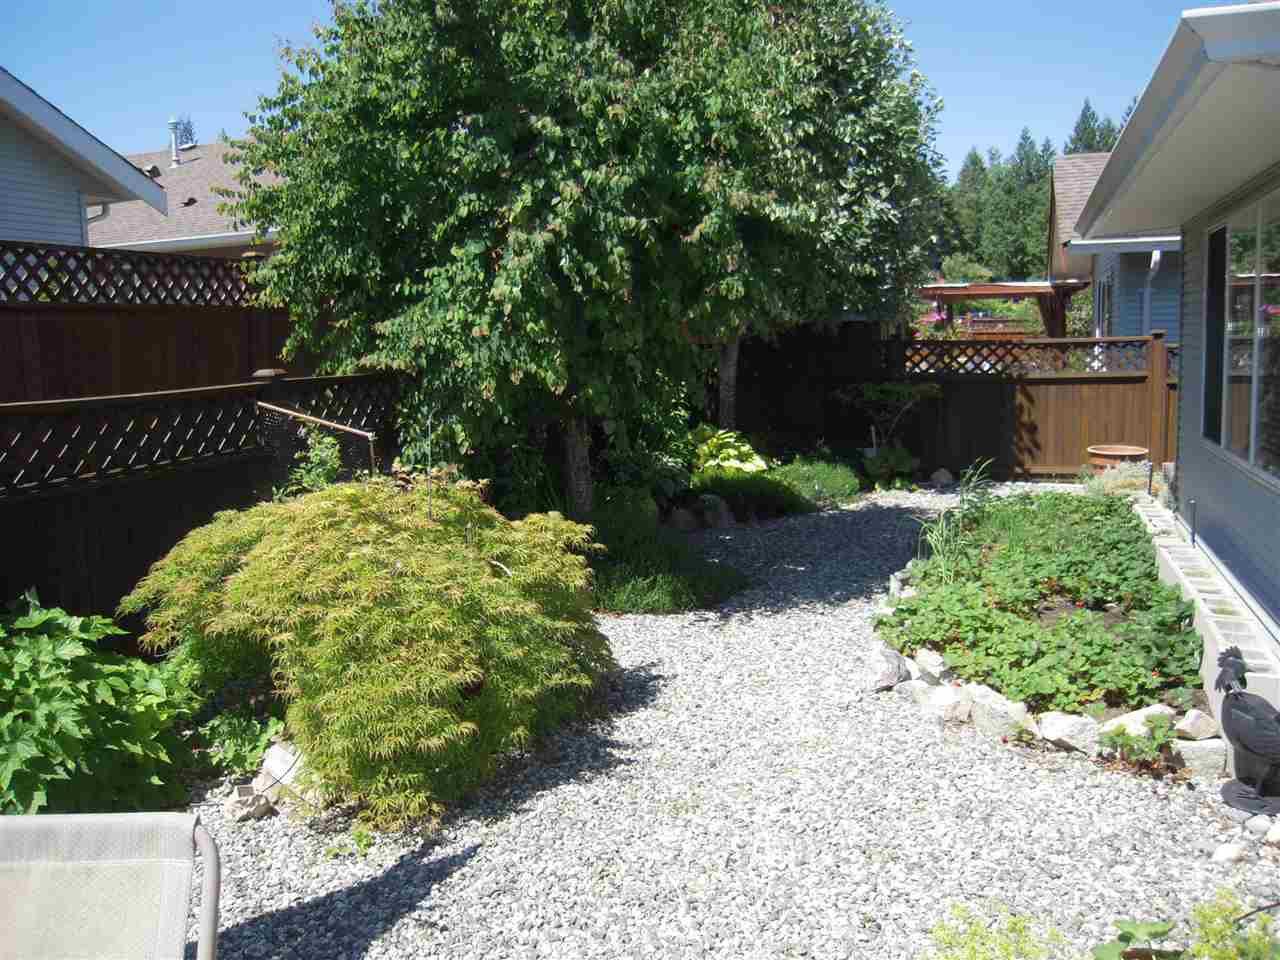 Photo 7: Photos: 5735 EMILY Way in Sechelt: Sechelt District House for sale (Sunshine Coast)  : MLS®# R2179124